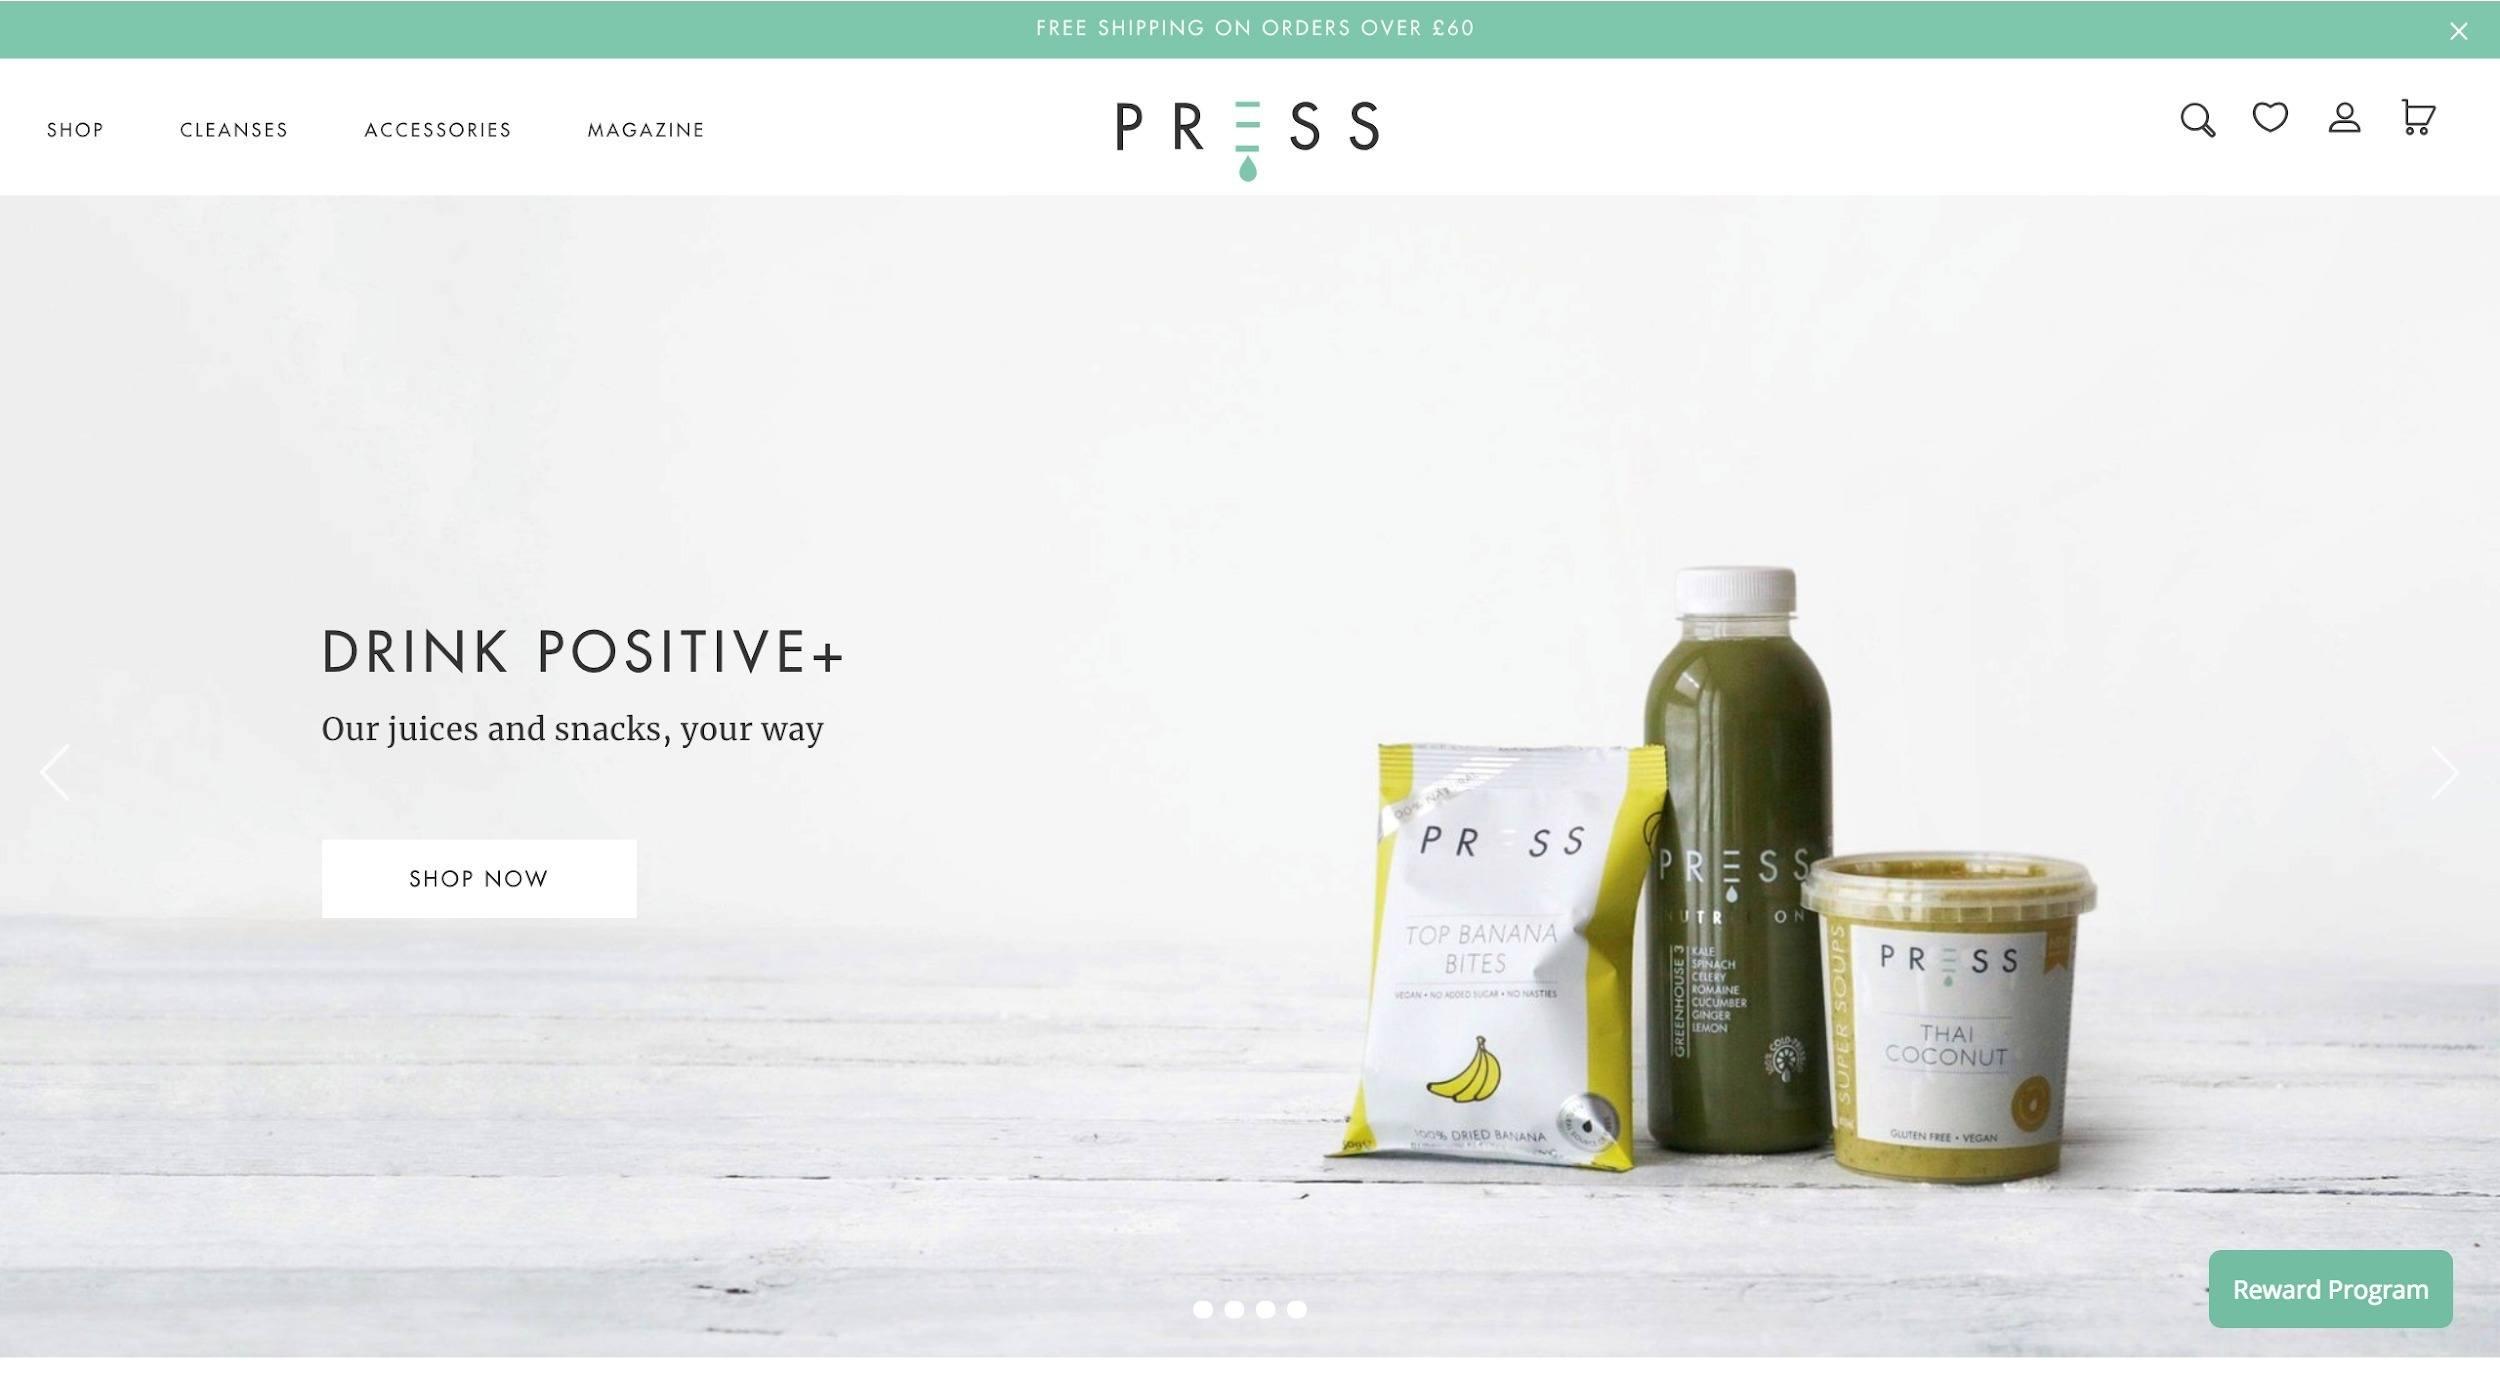 press-london-shopify-website